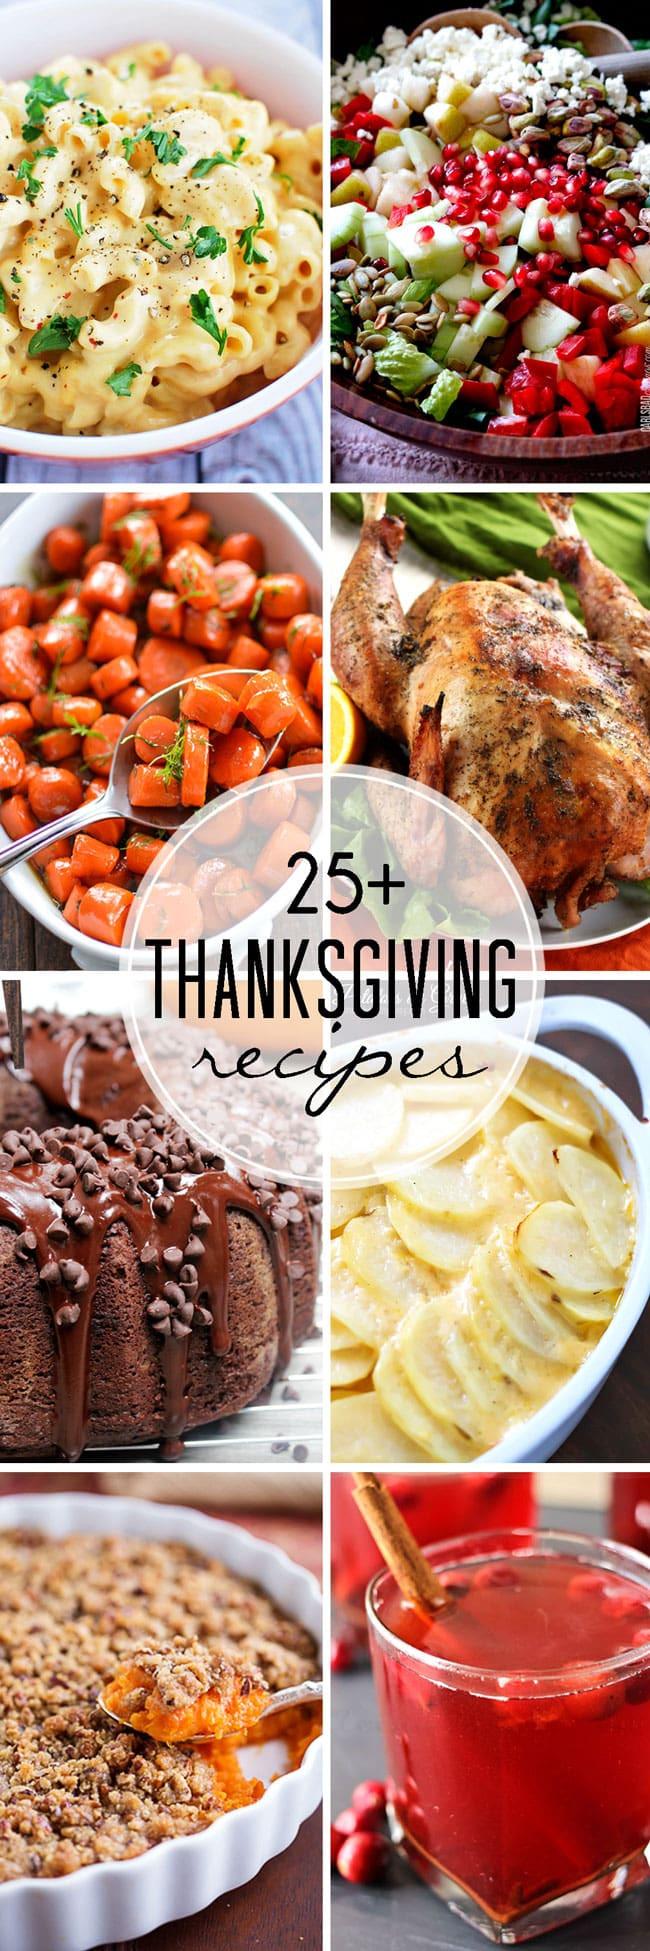 Thanksgiving Dinner Ideas Pinterest  25 Thanksgiving Recipes Easy Peasy Meals